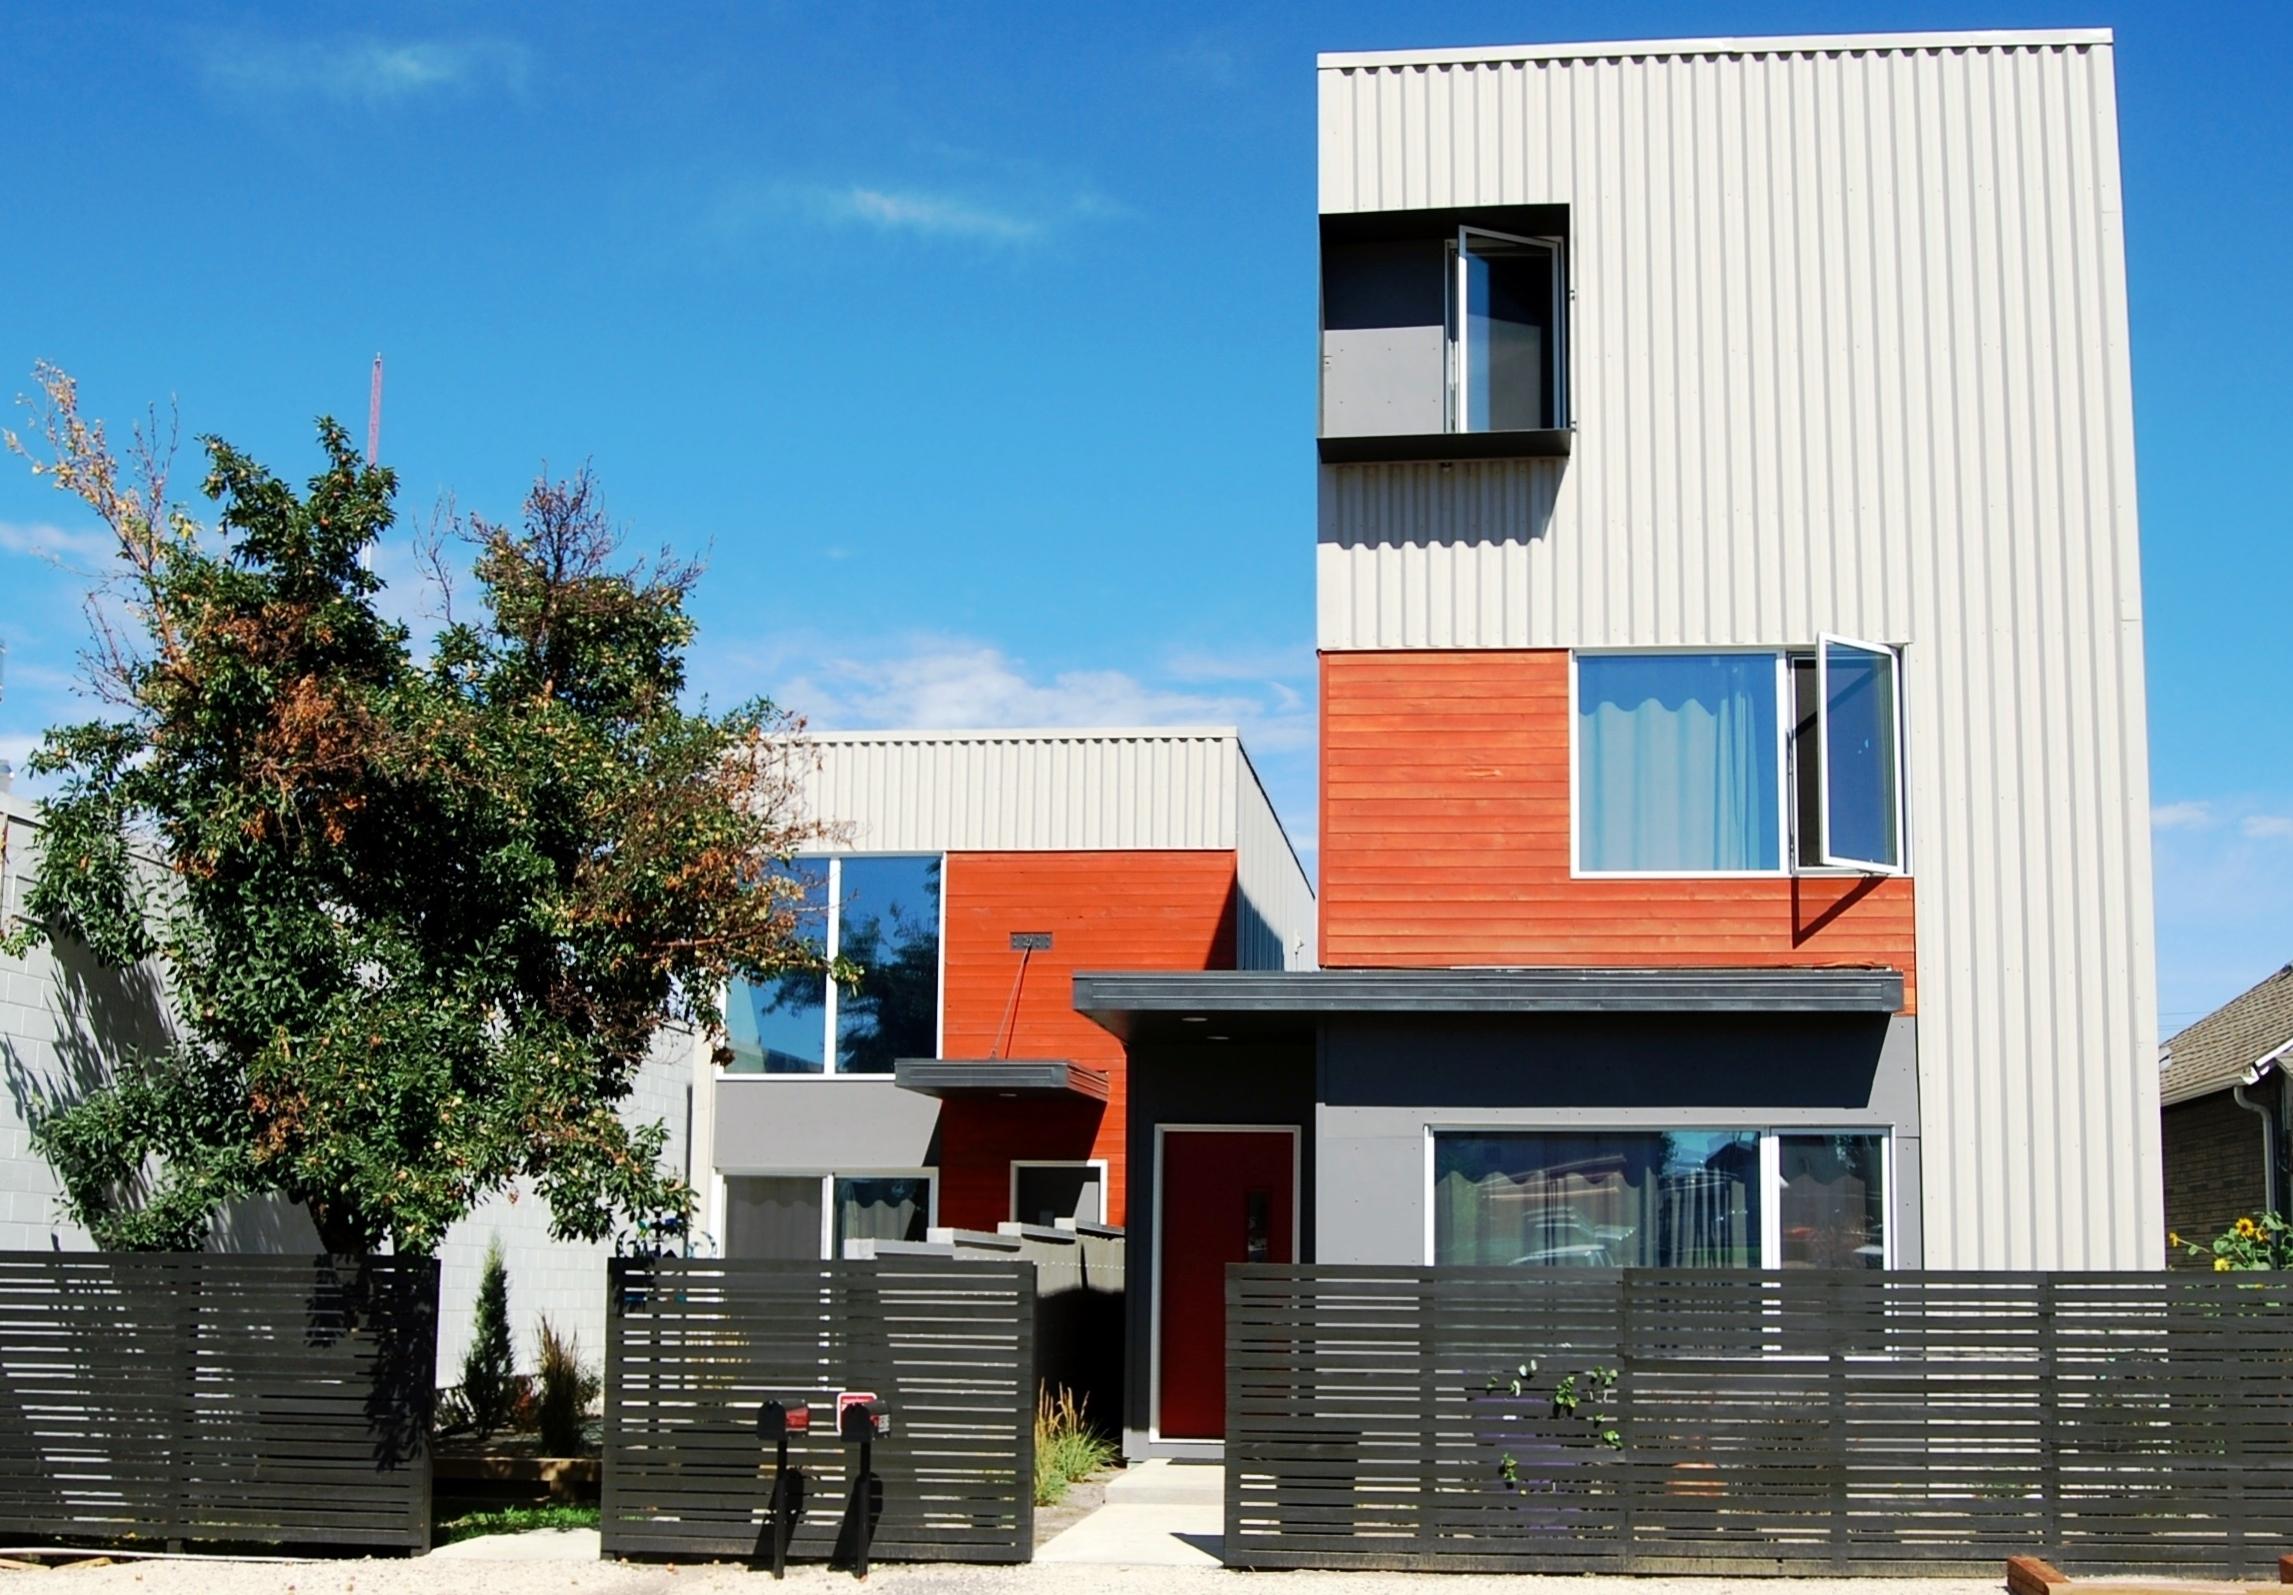 Denver s modern homes open for tour this weekend for Modern homes in denver